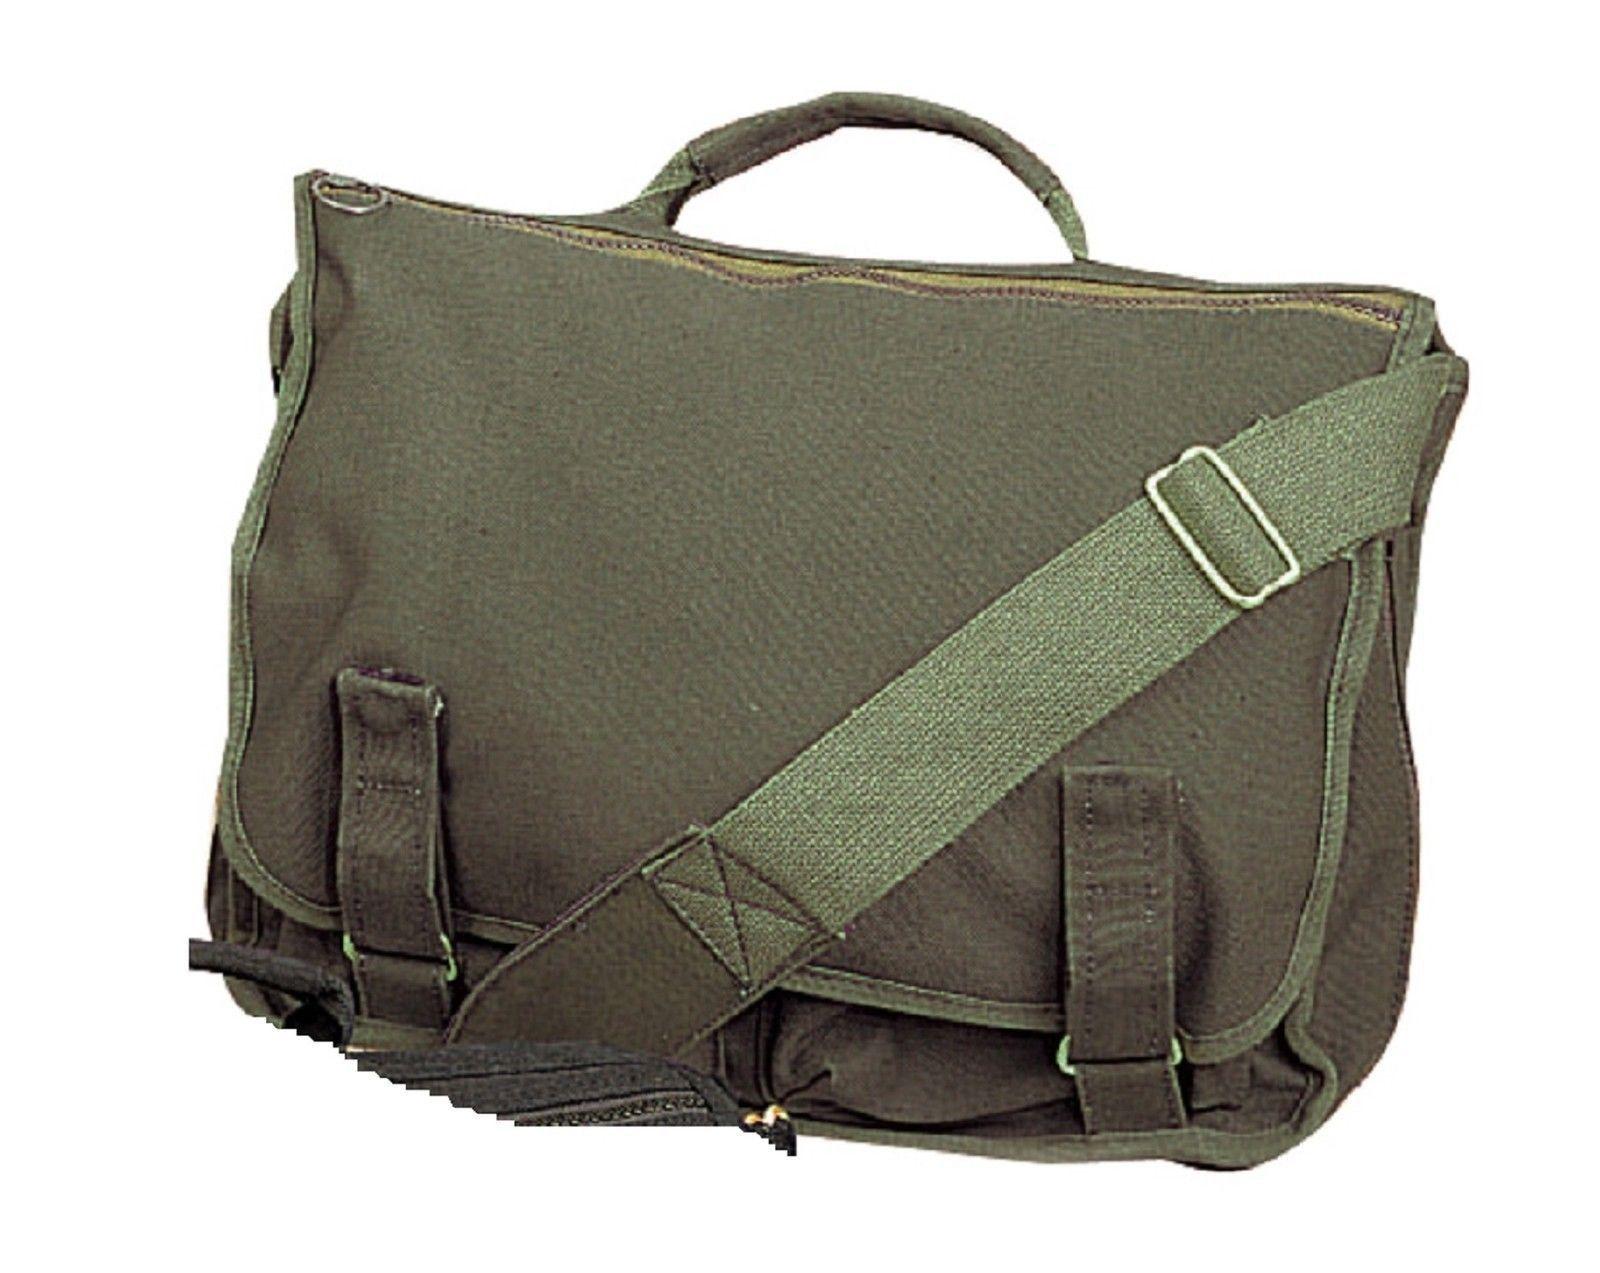 f18eef68da0 ... European Style School Bags - Canvas Versatile Shoulder Messenger Book  Bag first rate 115b5 be629 ...